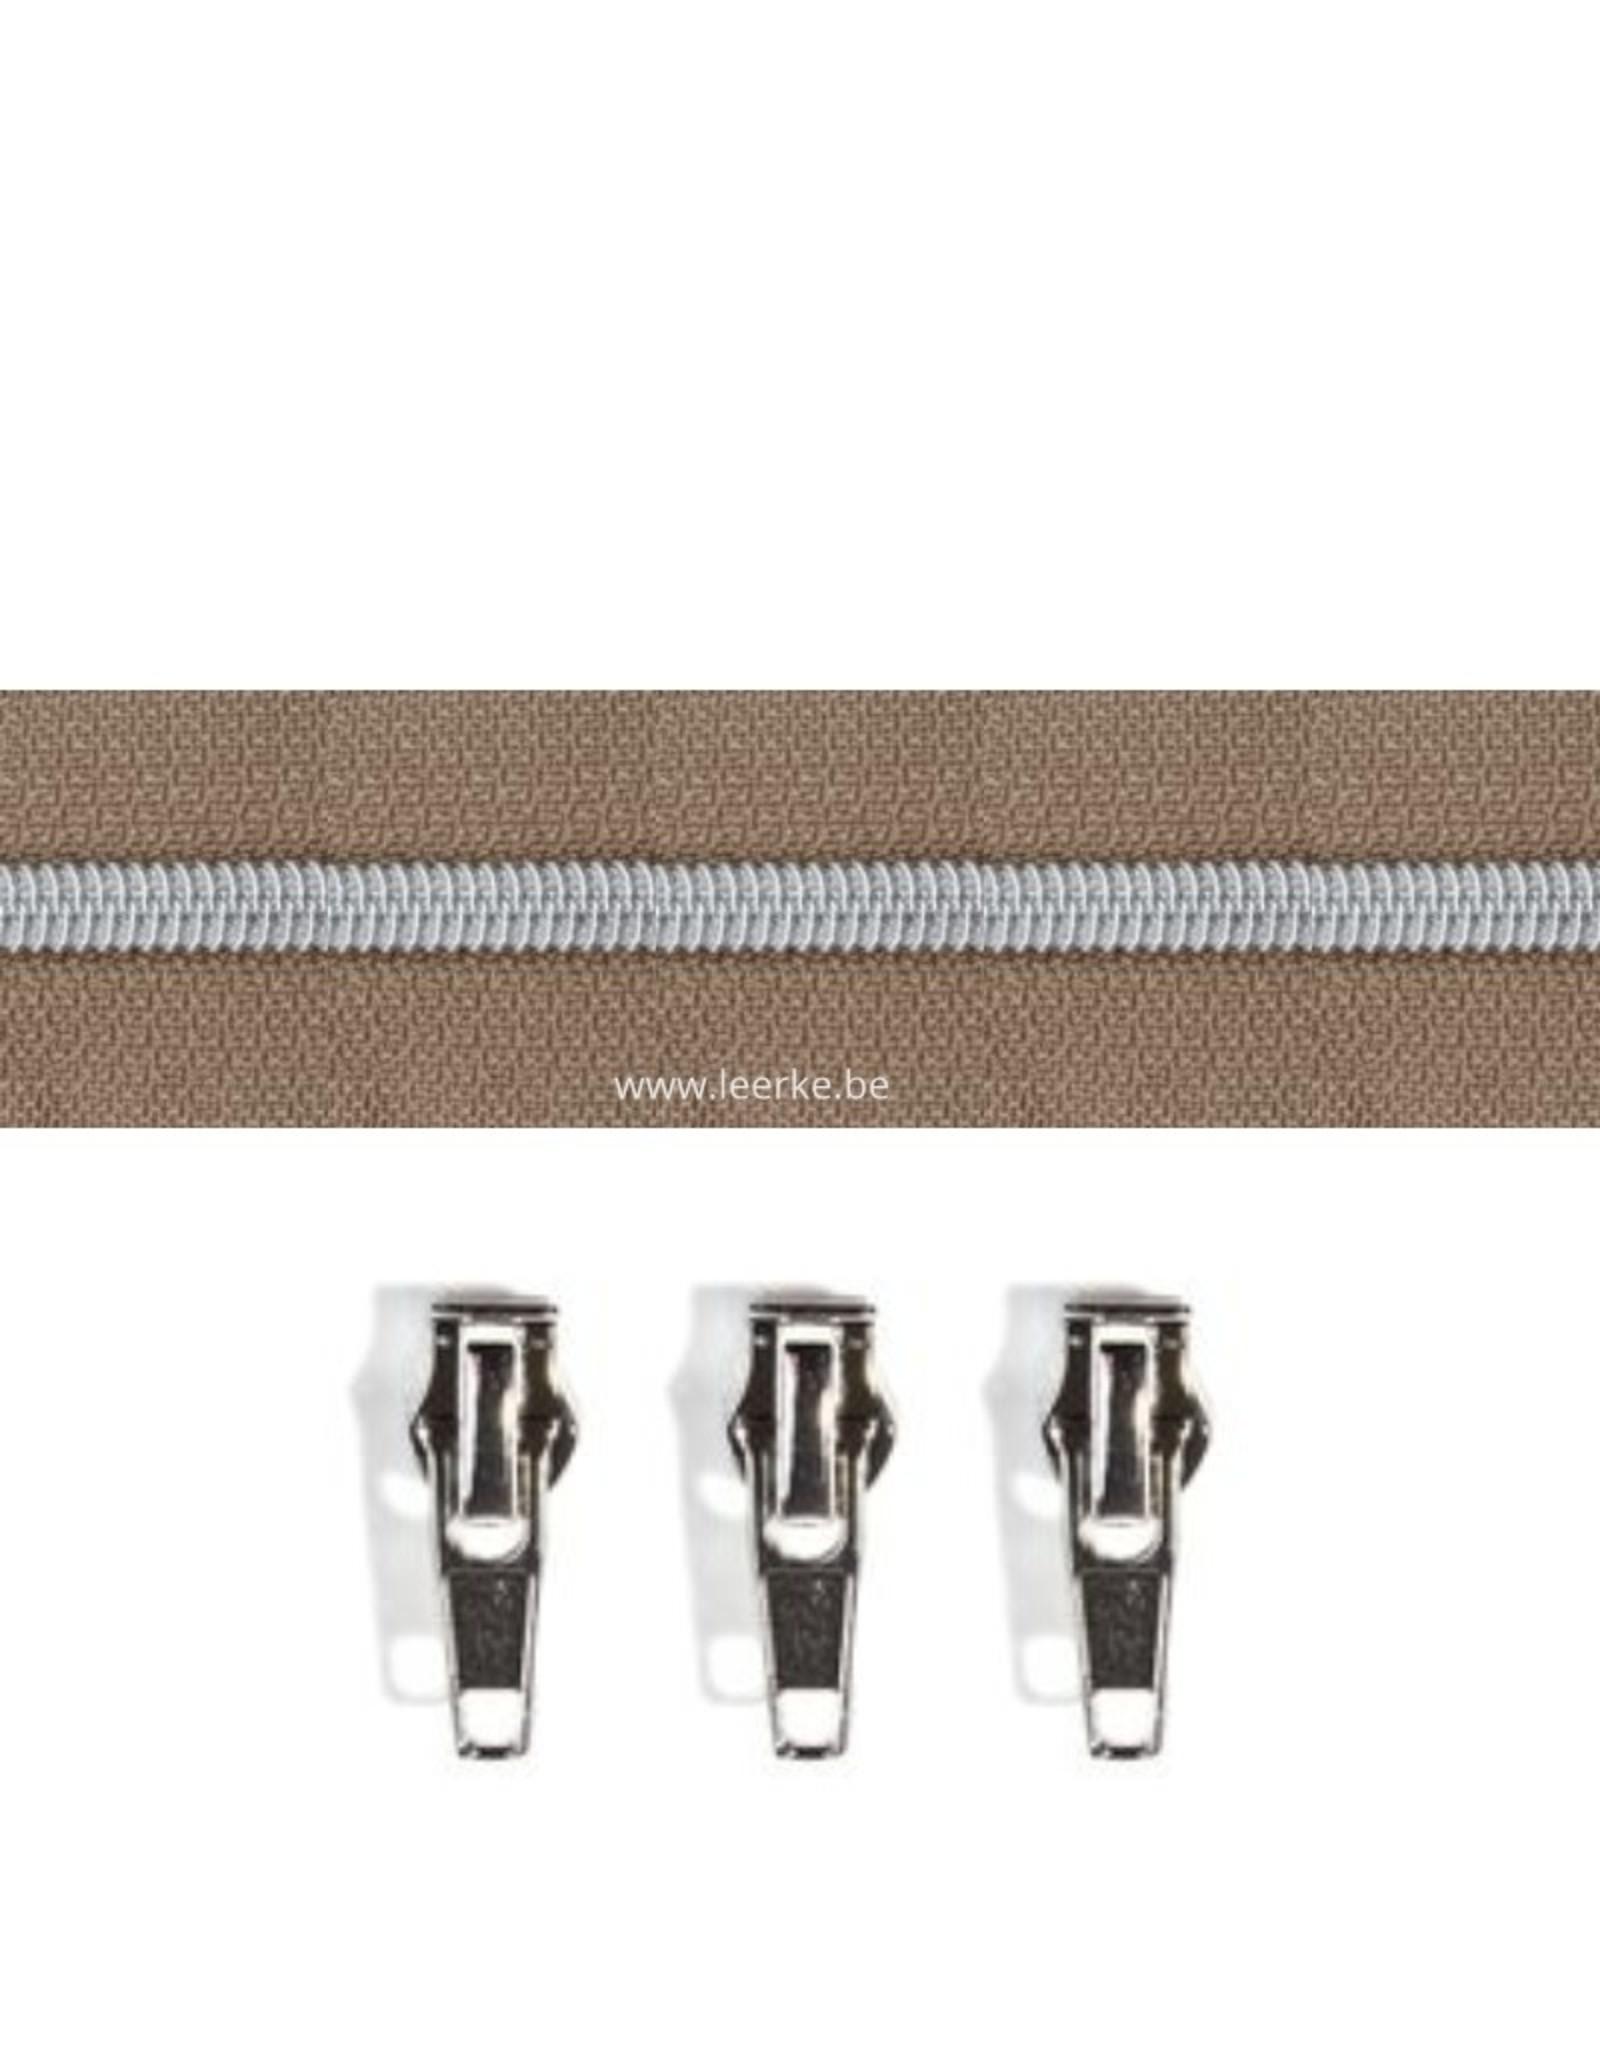 Rits per meter (incl. 3 trekkers) - Gunmetal - Zachtbruin- Size 6,5